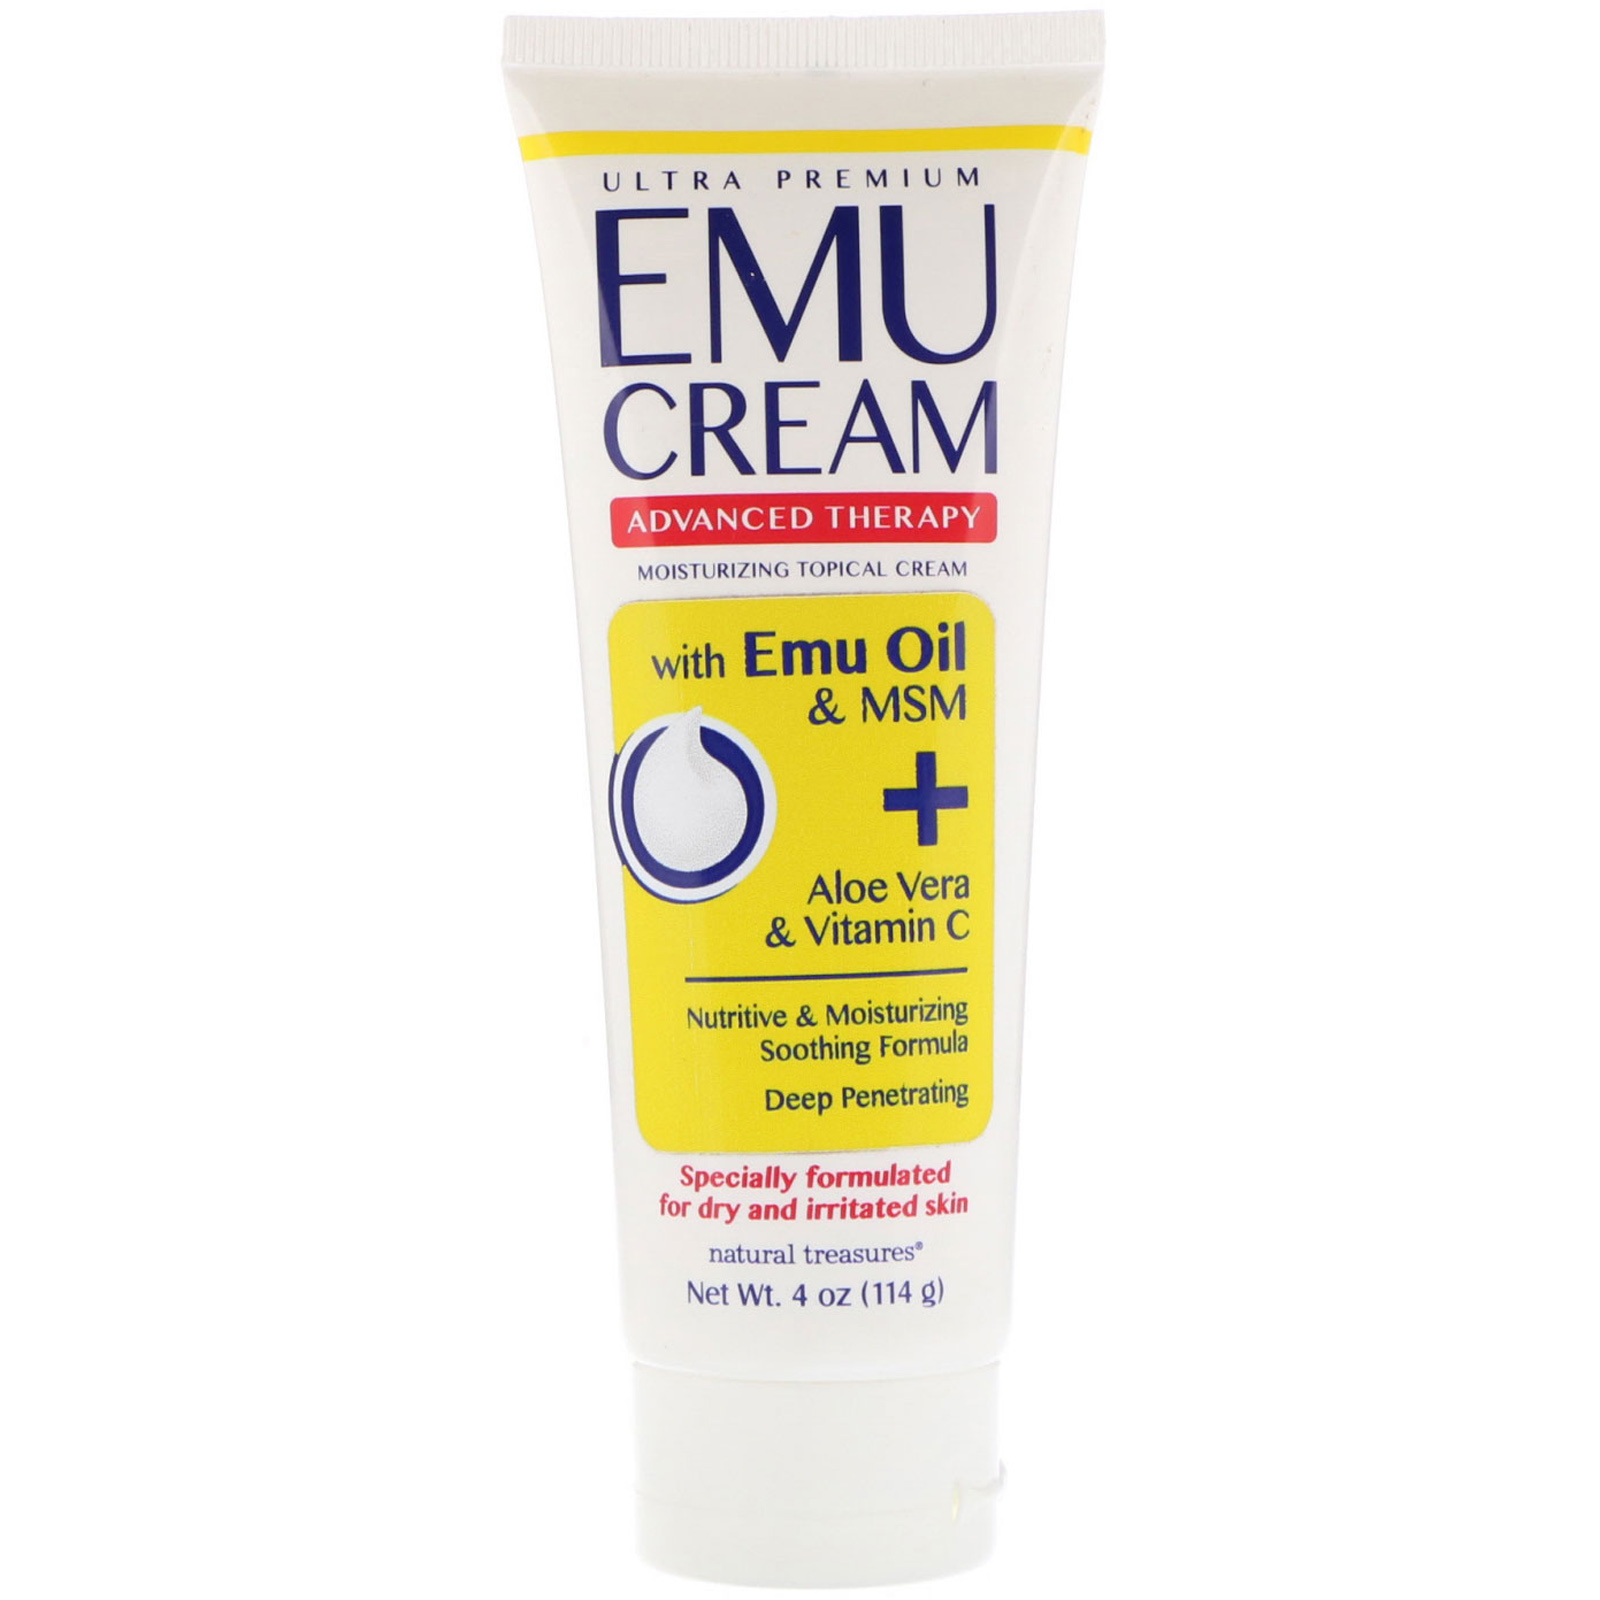 Natural Treasures, Emu Cream with Emu Oil & MSM + Aloe Vera & Vitamin C, 4  oz (114 g)